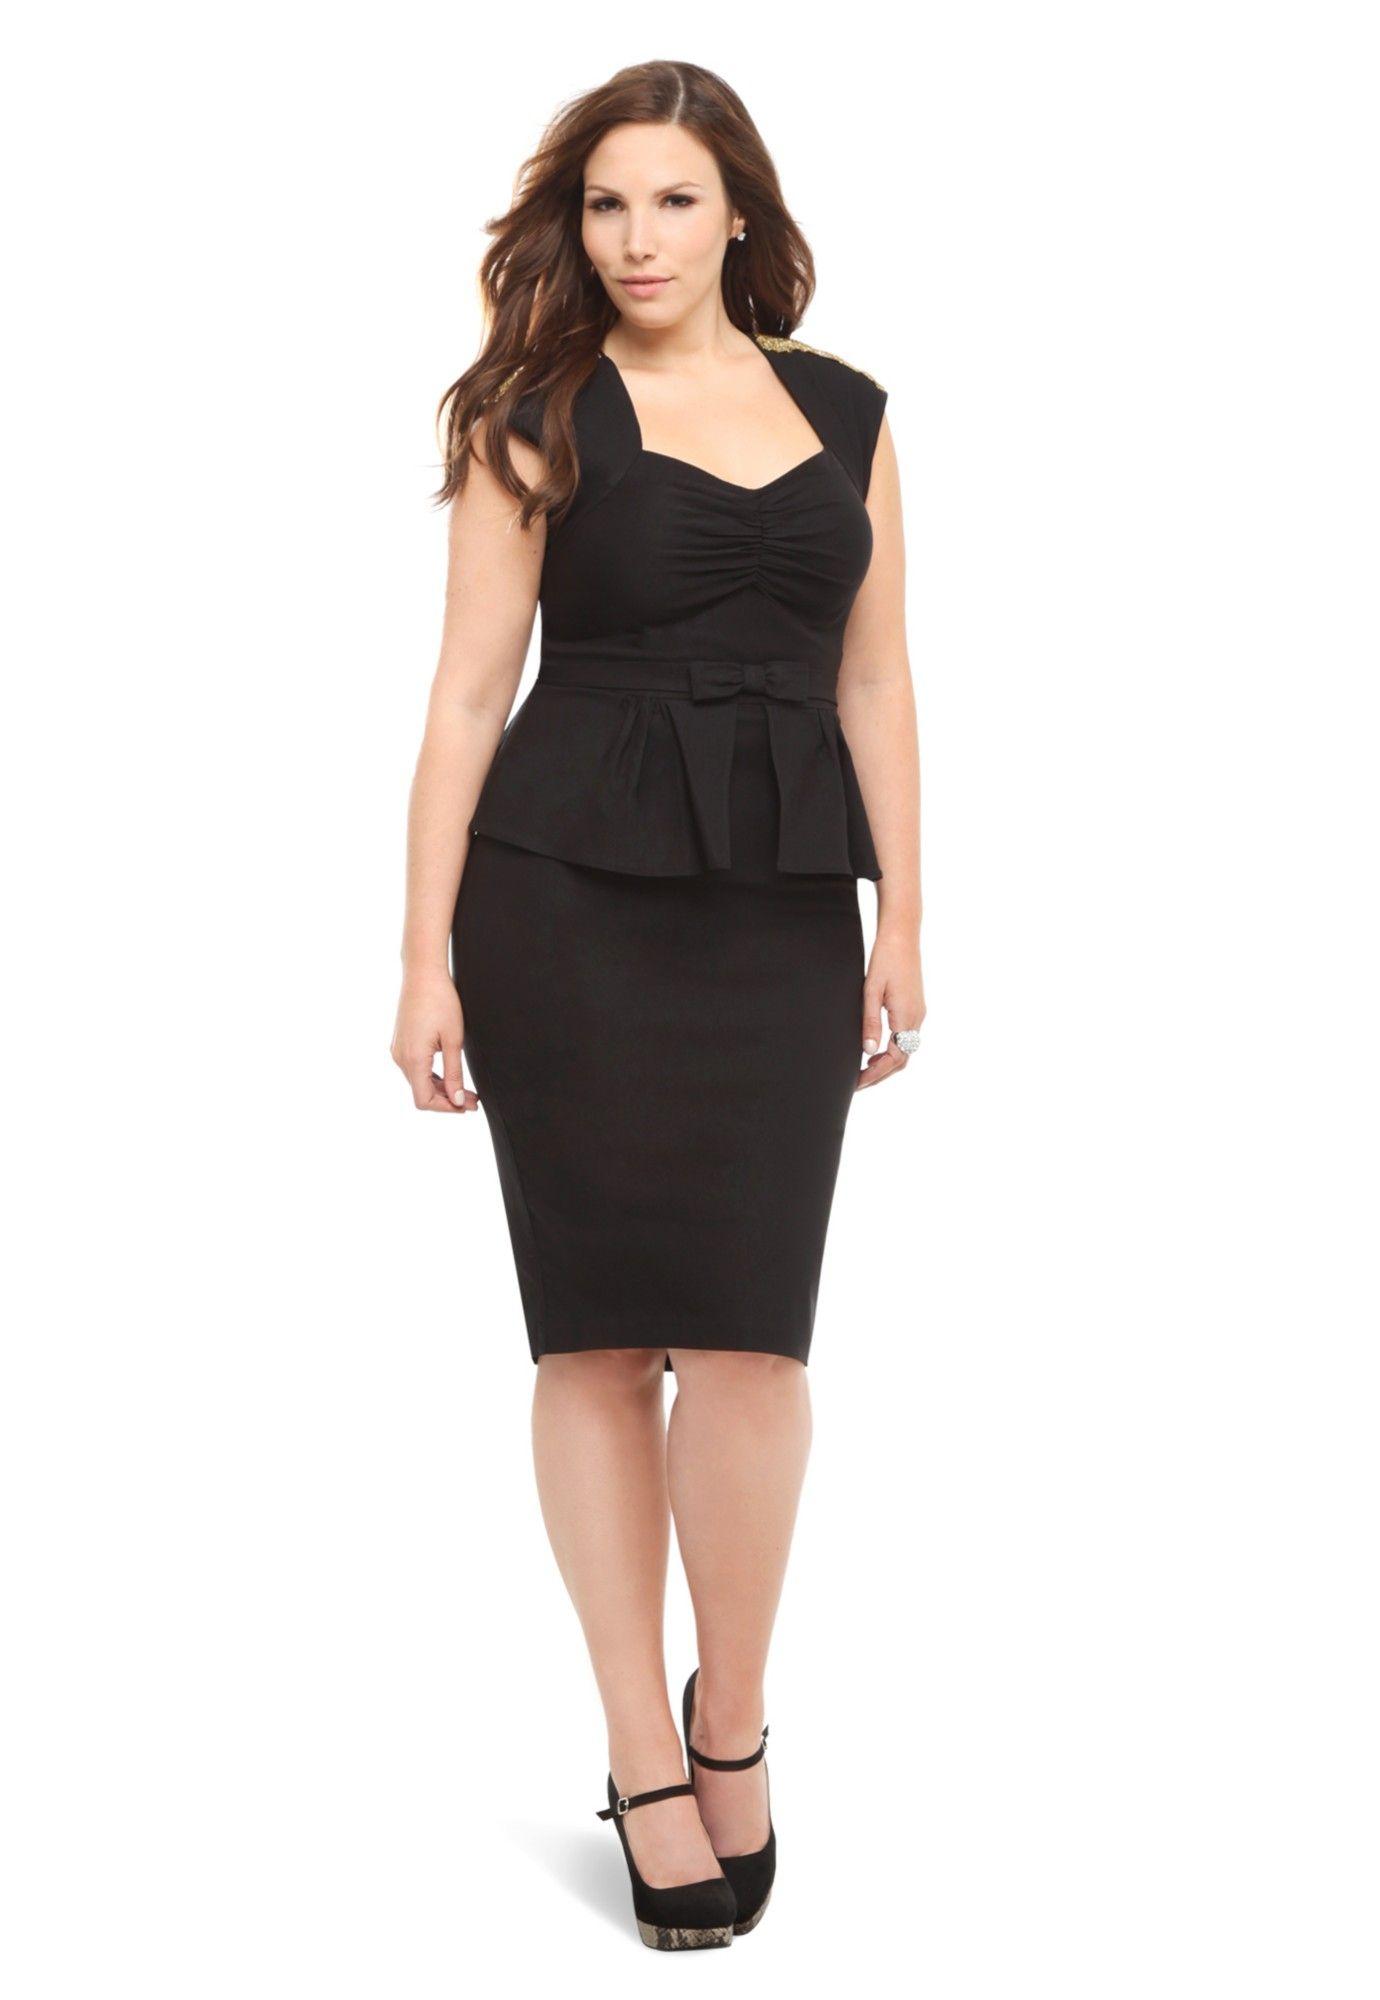 81f34a243e9 Black With Gold Beads Peplum Icon Dress plus size